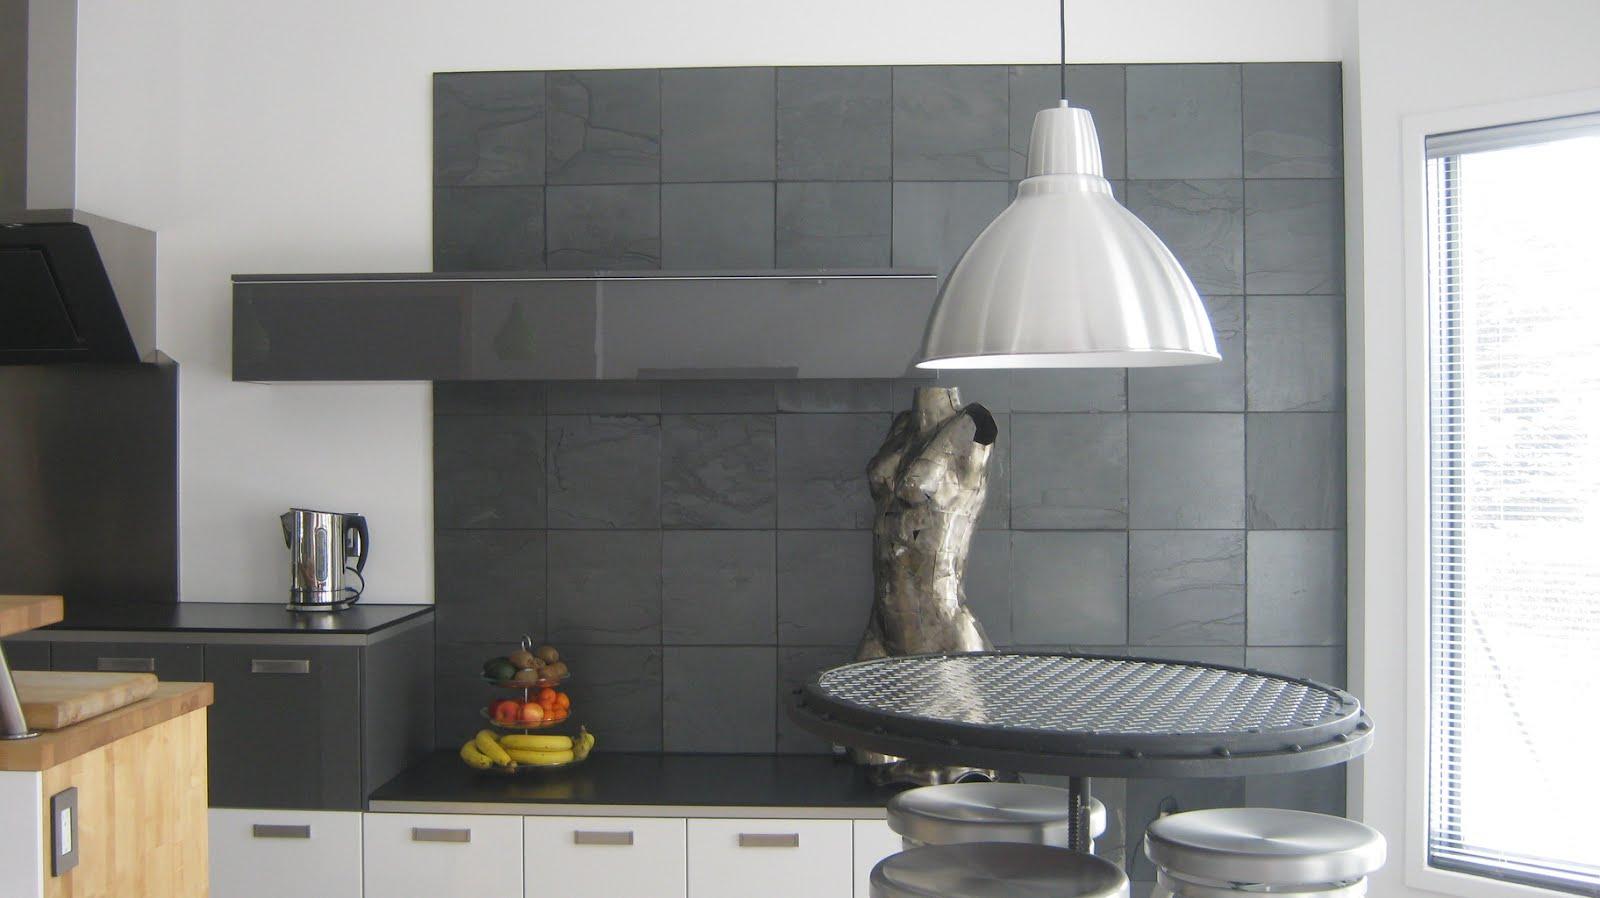 IKEA High Gloss Kitchen Cabinets